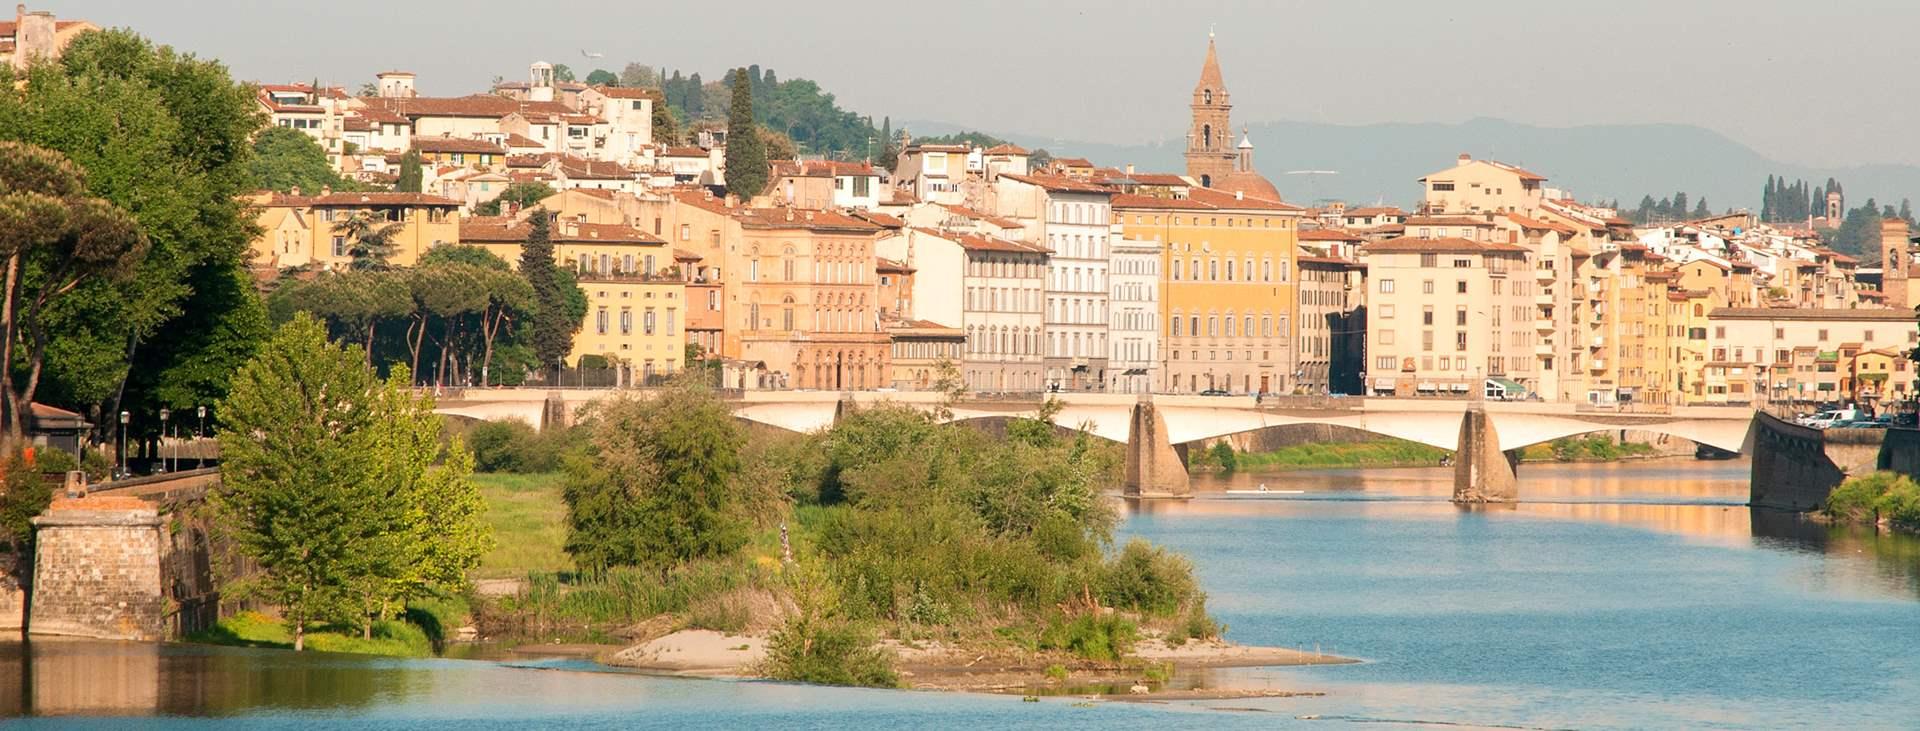 Boka din resa till Florens i Italien med Ving